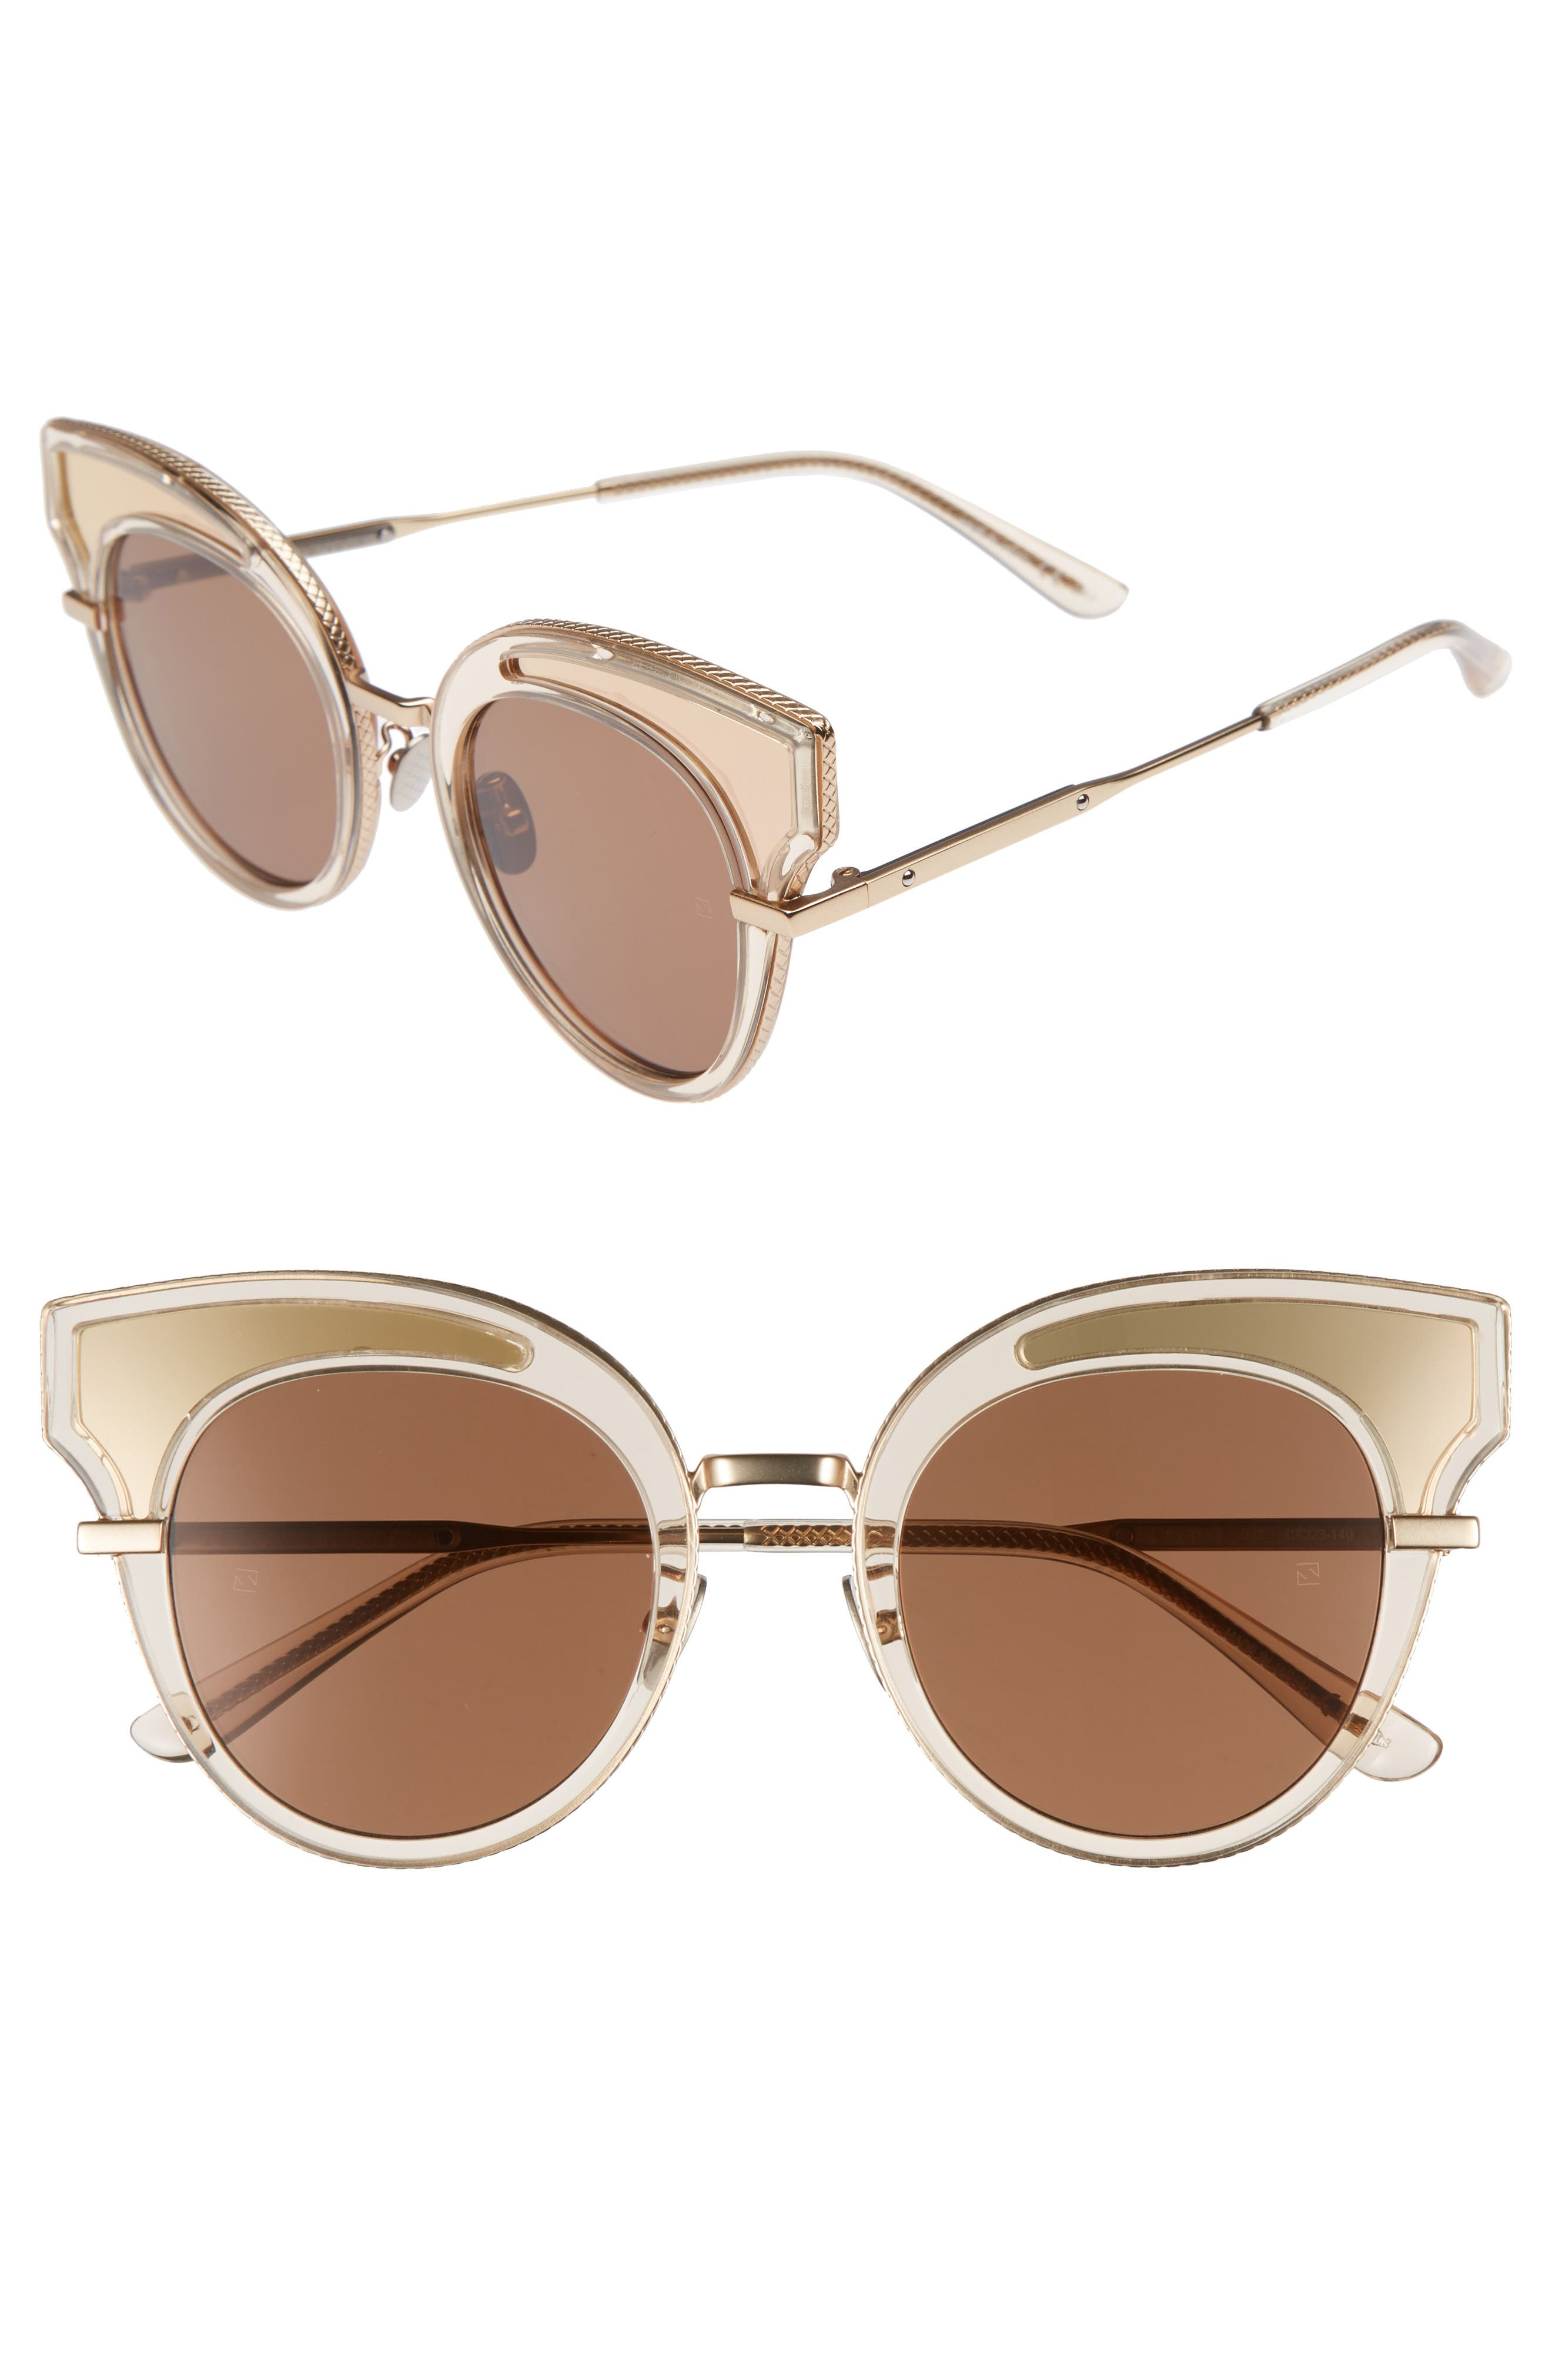 49mm Cat Eye Sunglasses,                             Main thumbnail 1, color,                             Yellow